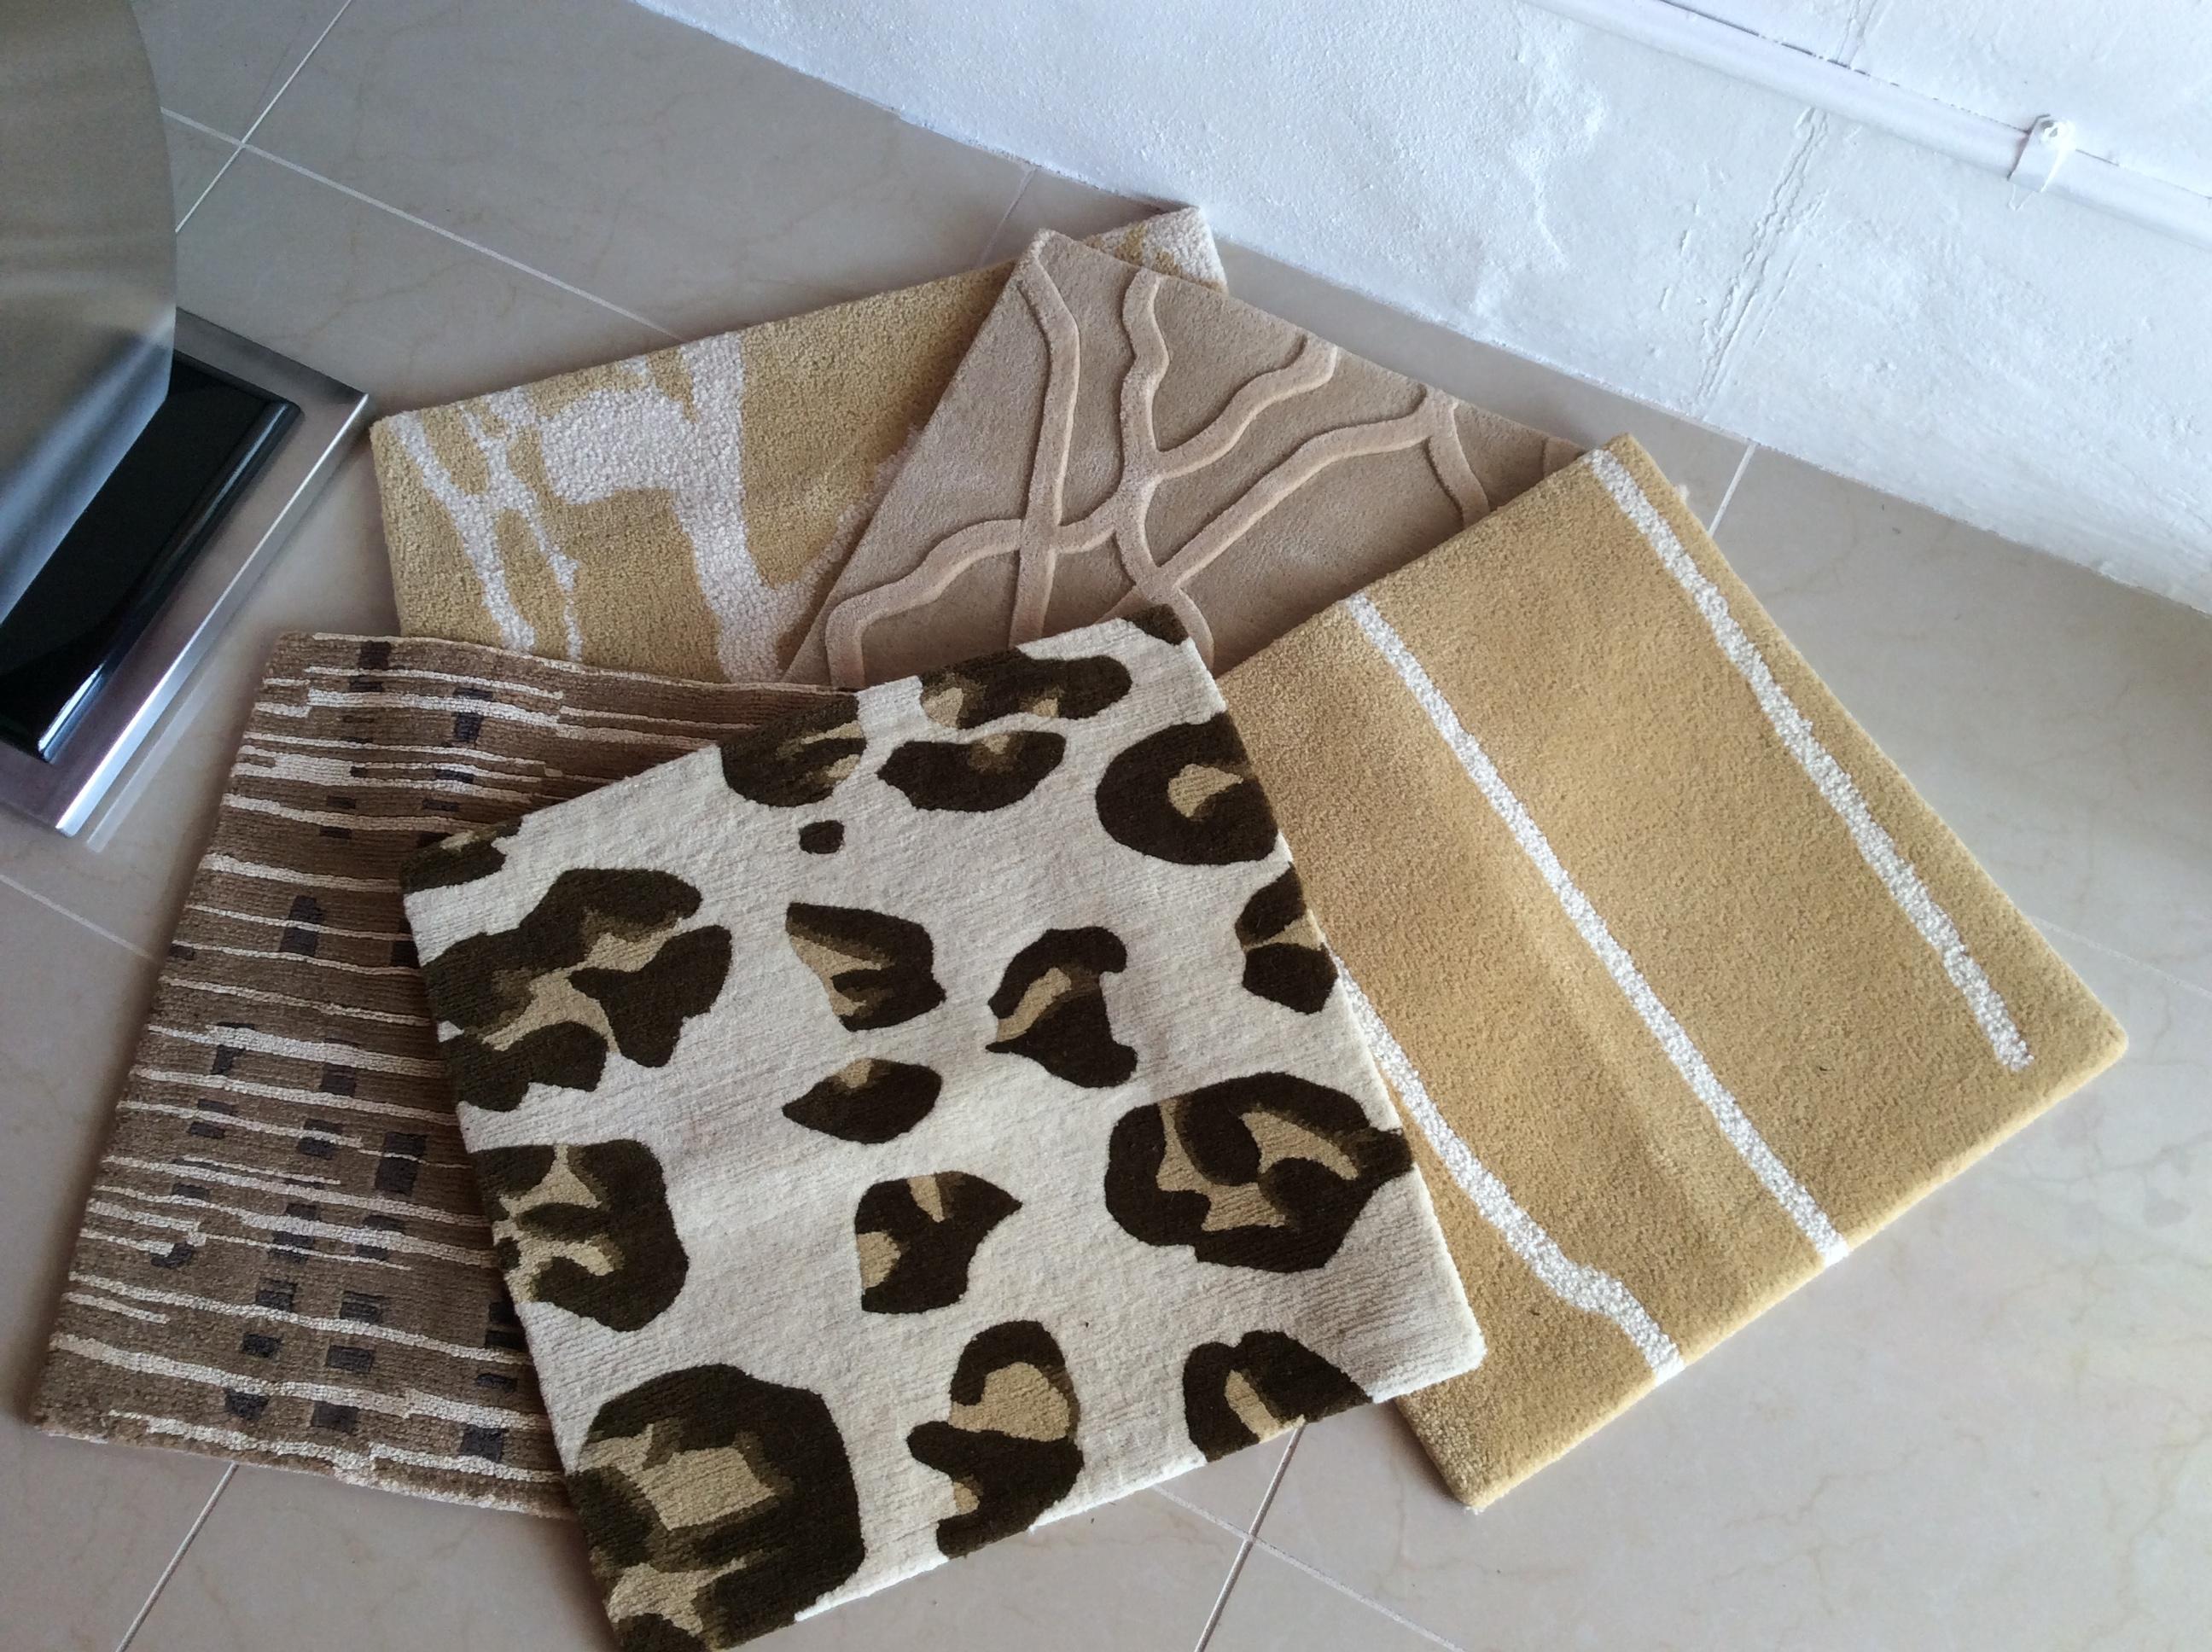 Rug Customized Rugs Wuqiangco Pertaining To Customized Rugs (Image 11 of 15)